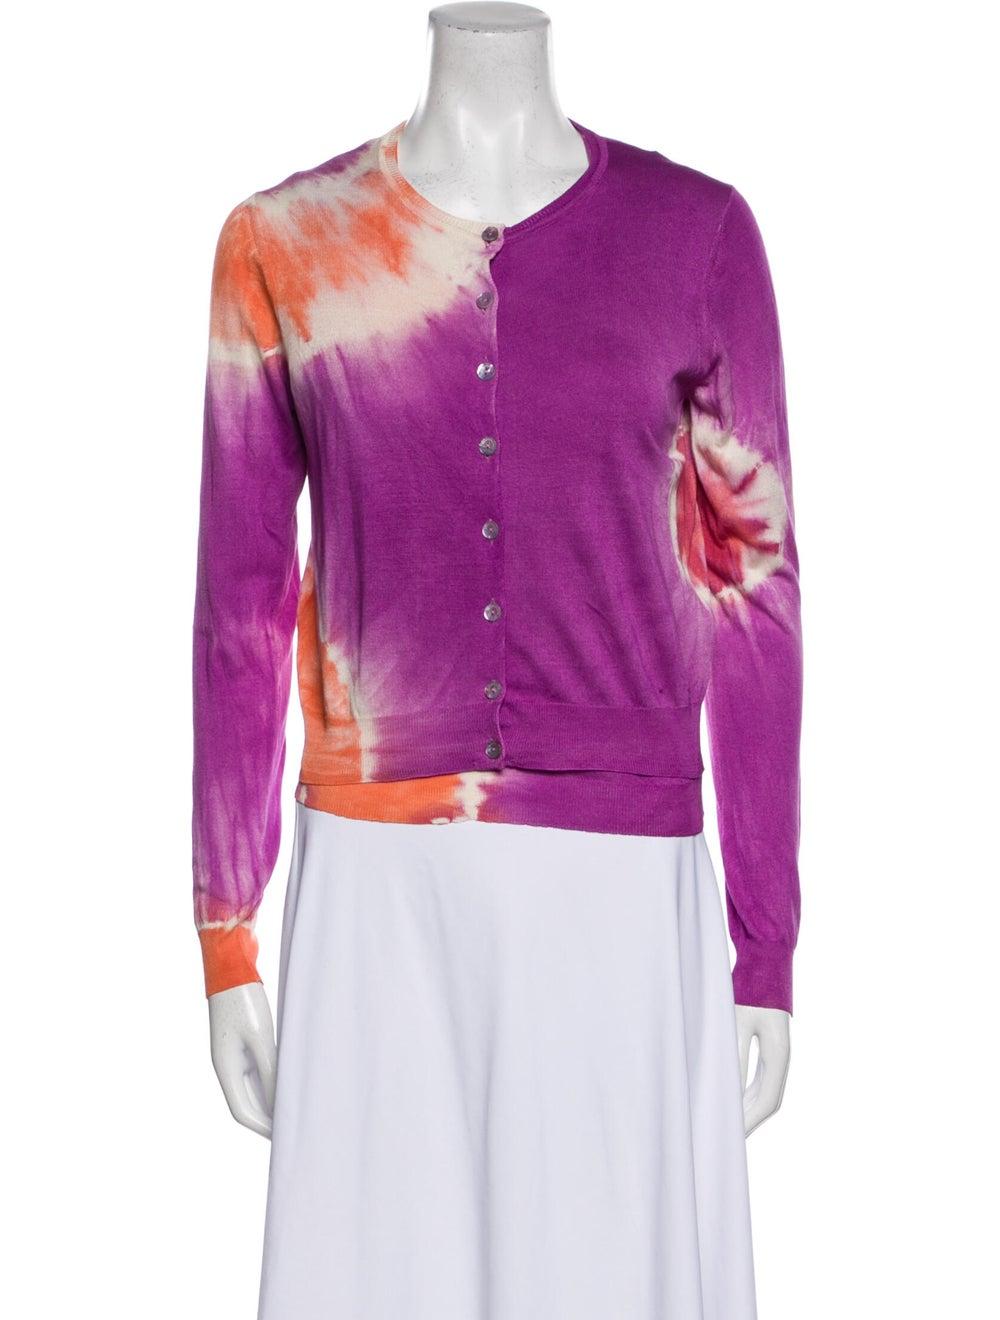 Blumarine Silk Tie-Dye Print Sweater Orange - image 1